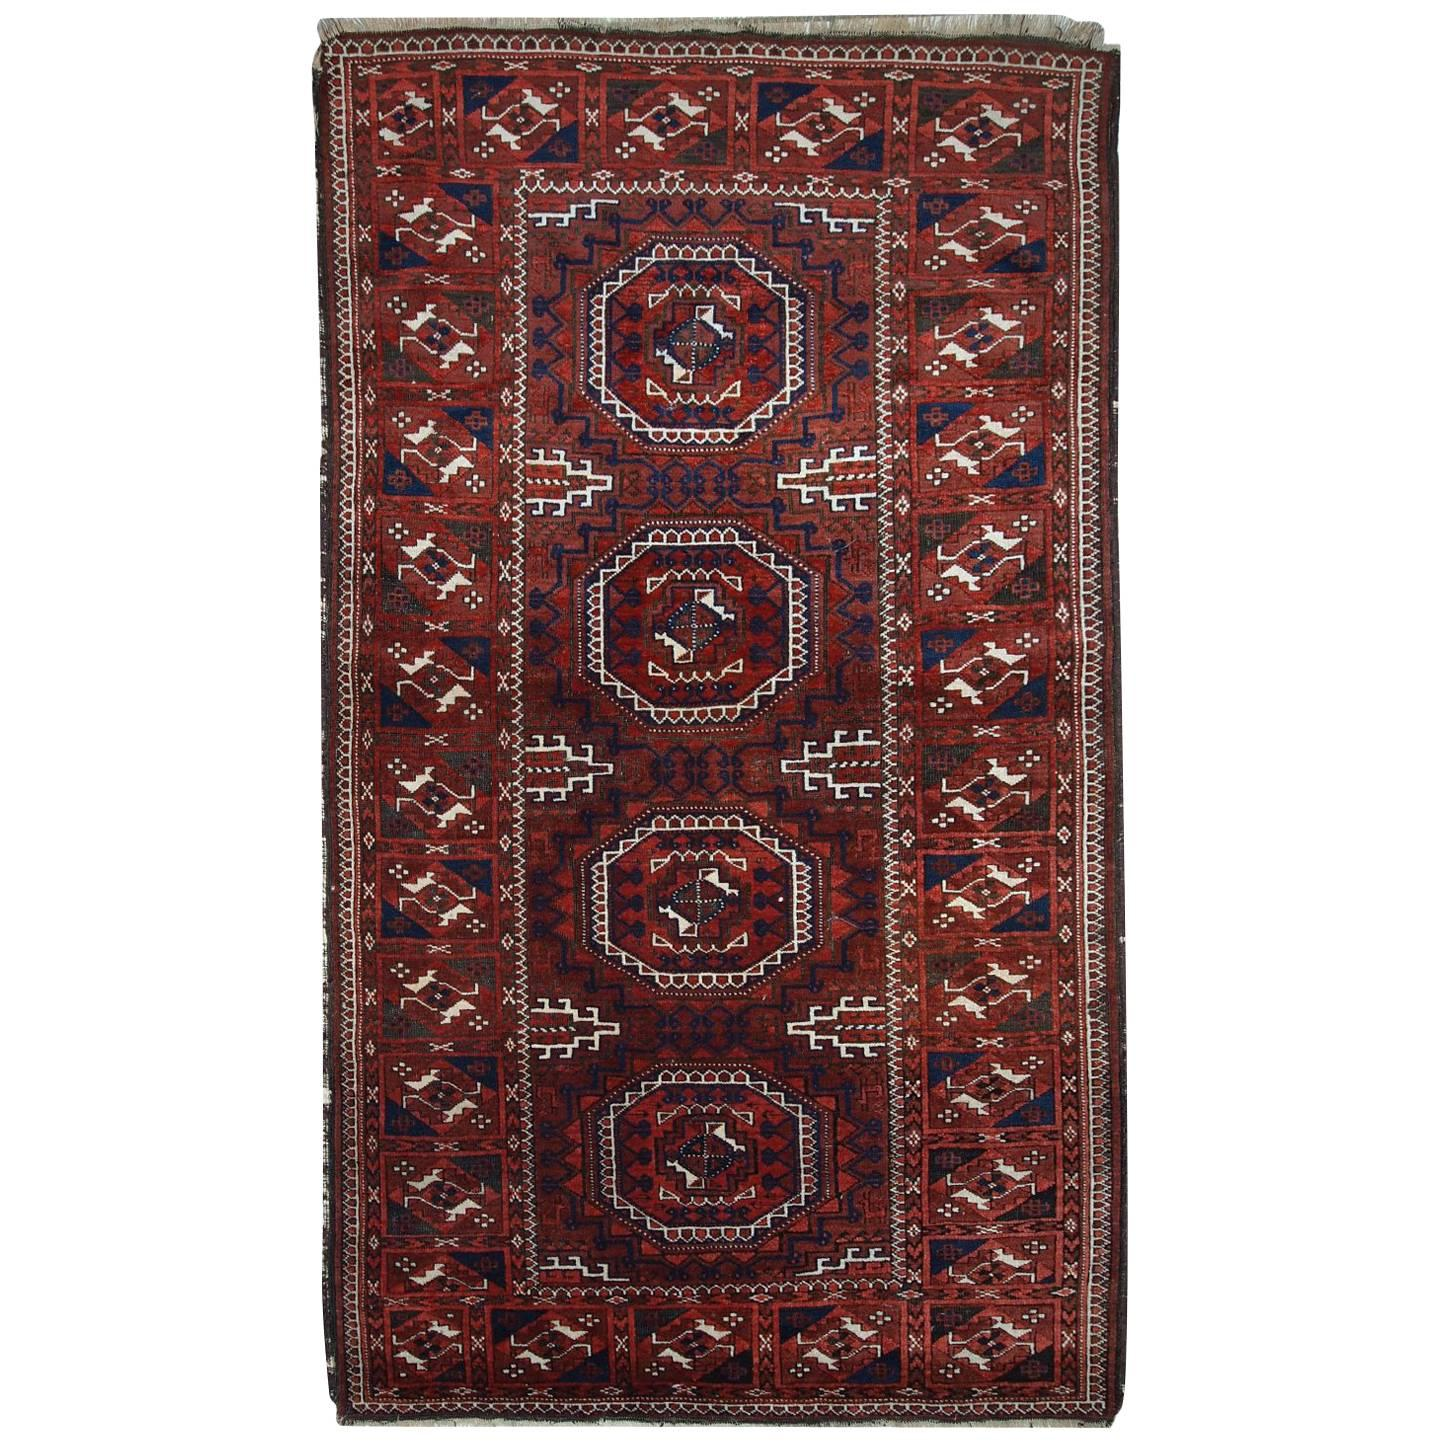 Handmade Antique Afghan Baluch Rug, 1900s, 1C357